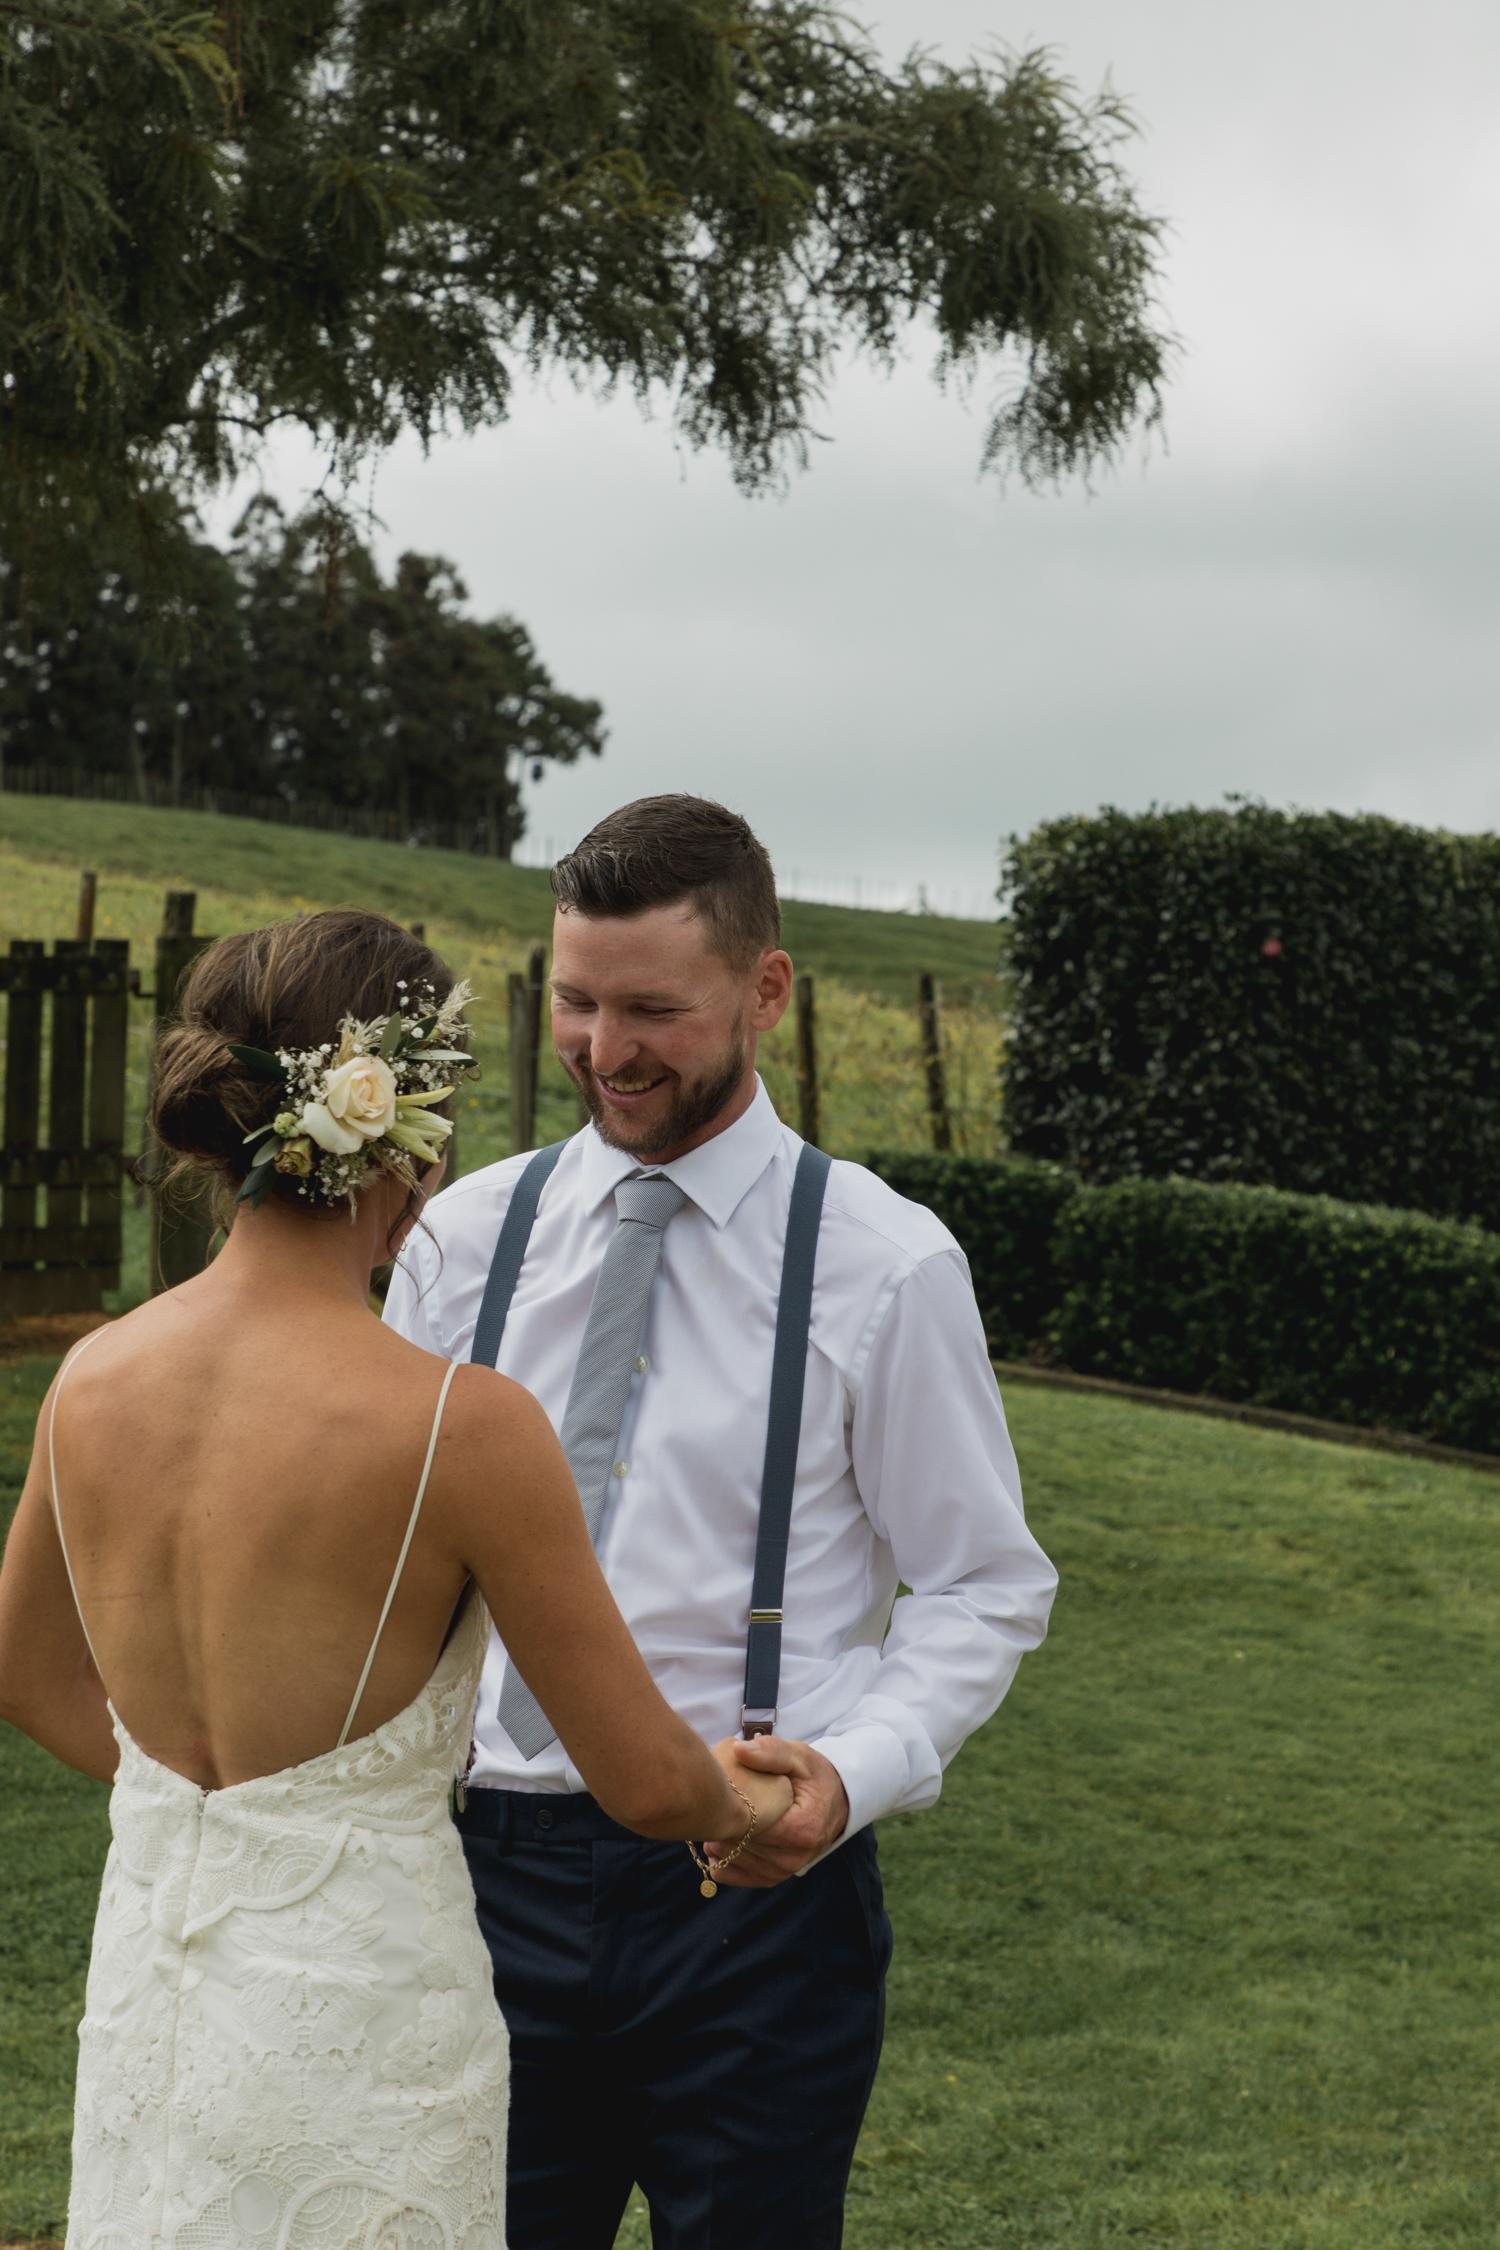 wedding-at-the-red-barn-new-zealand-wedding-photographer-groom-seeing-bride-in-her-dress.jpg